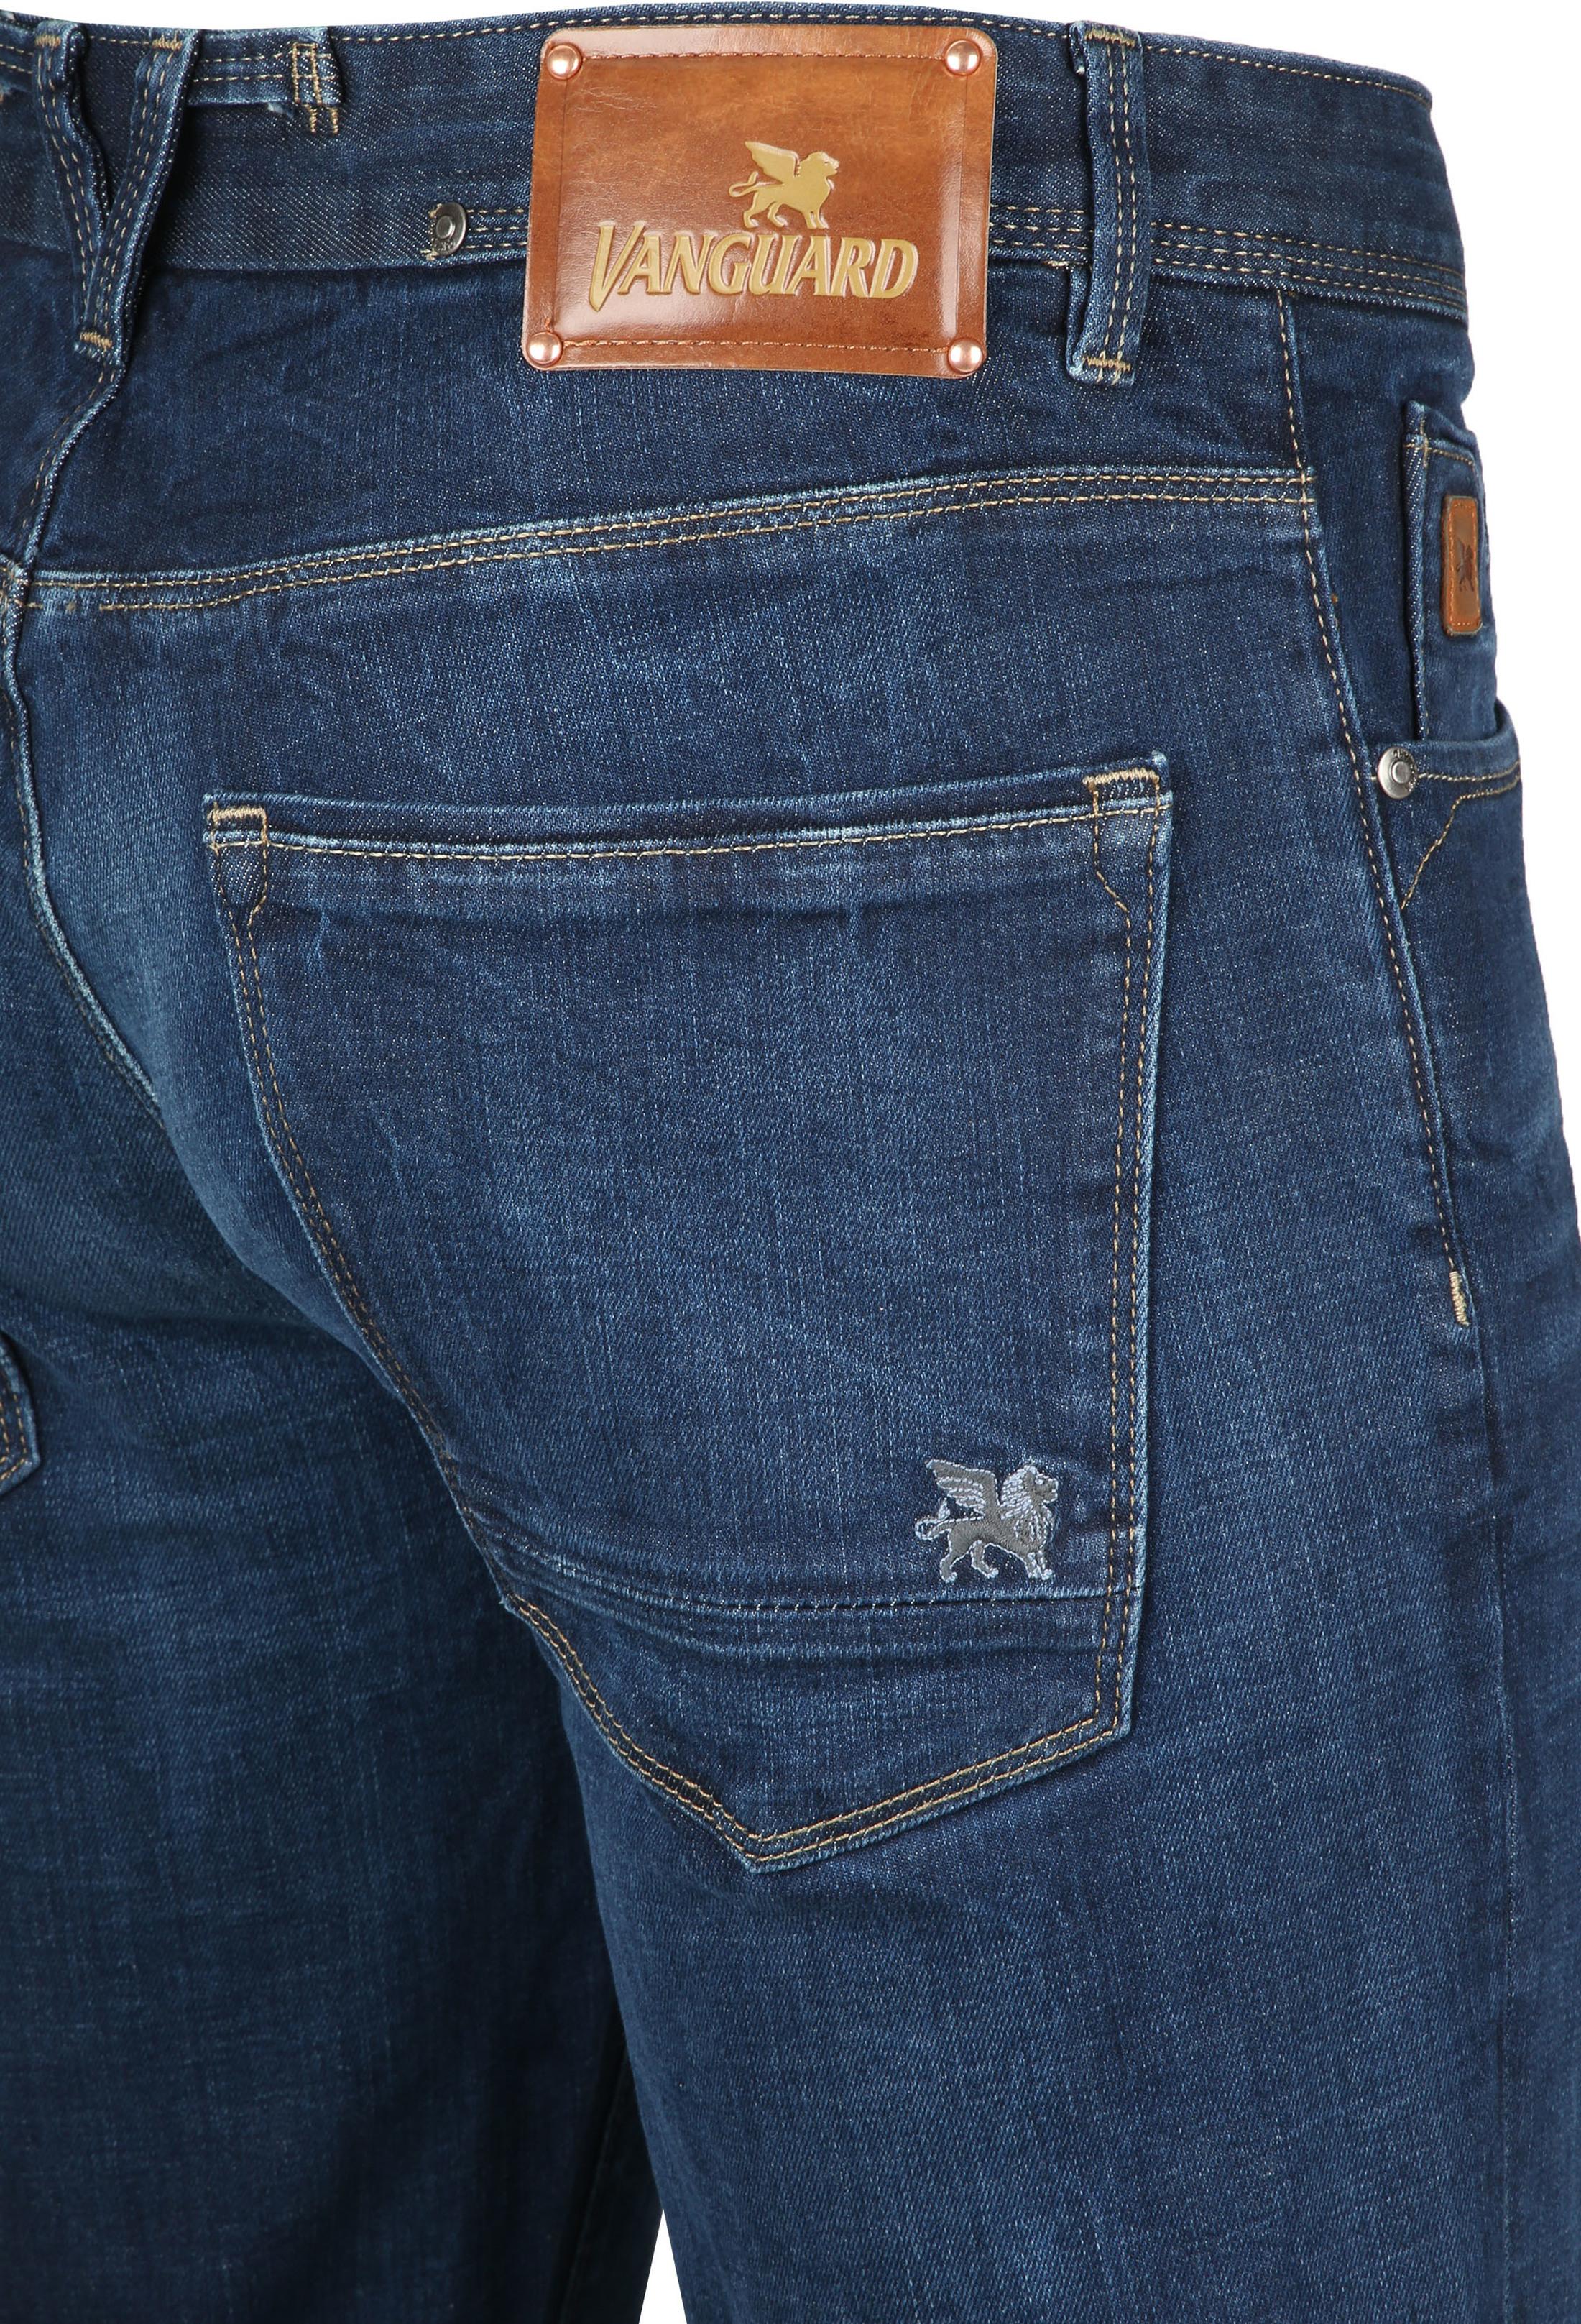 Vanguard Jeans V7 Rider Pure Blue